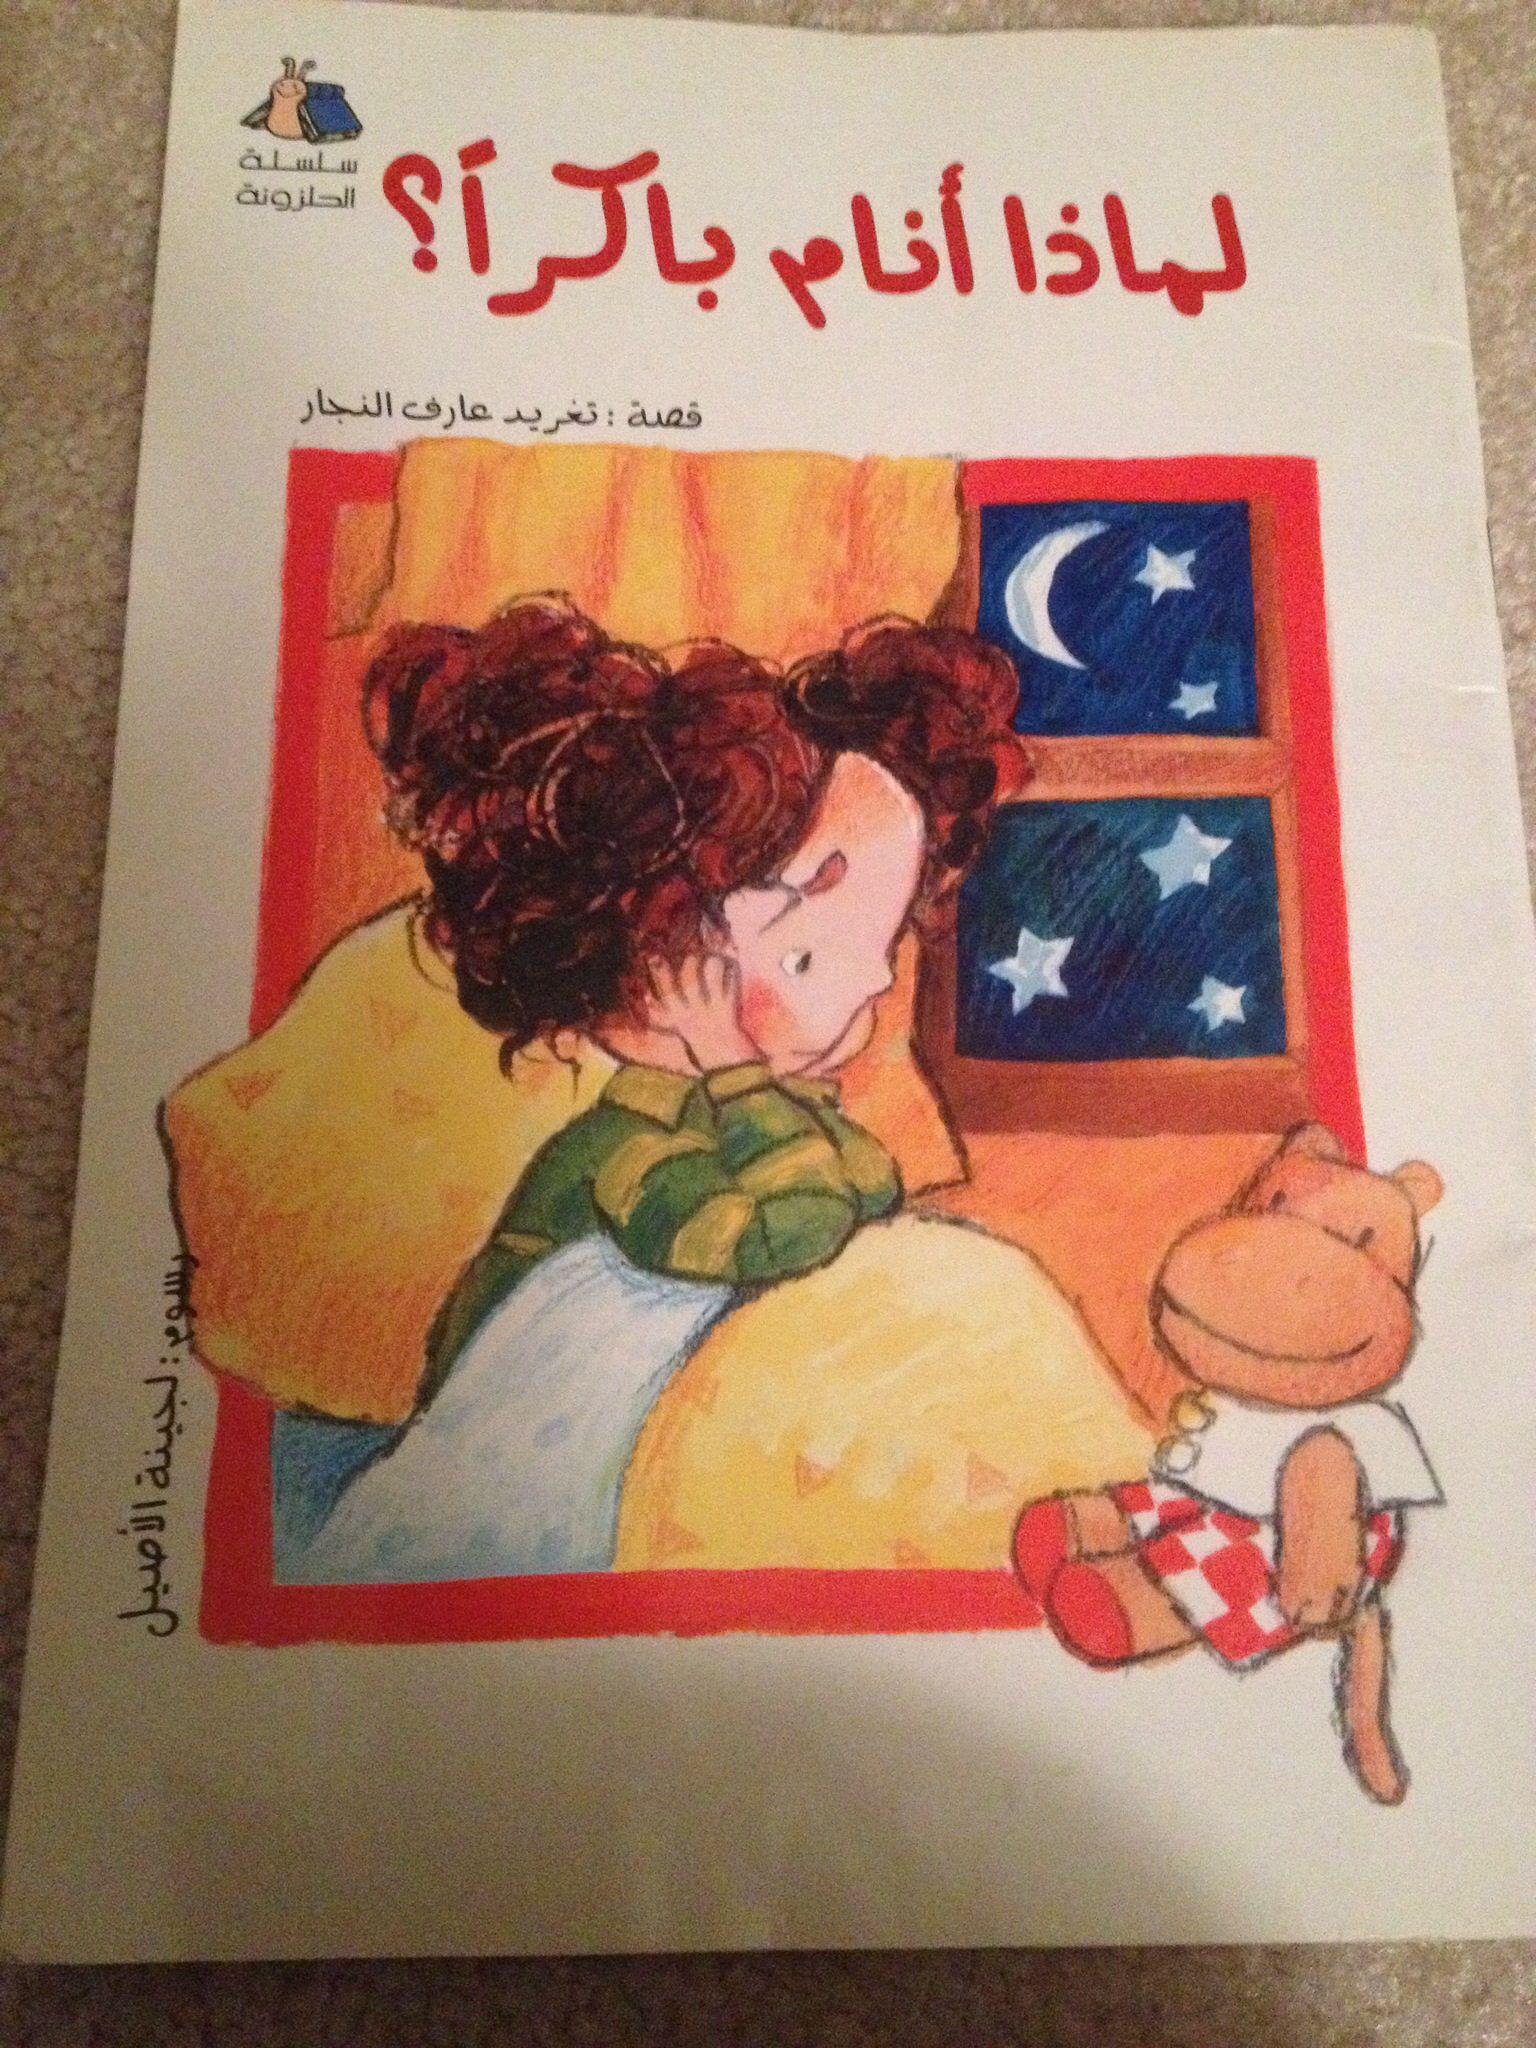 Why Should I Sleep Early Children S Arabic Book Fun And Simple Story Line Arabic Kids Arabic Books Childrens Bookstore